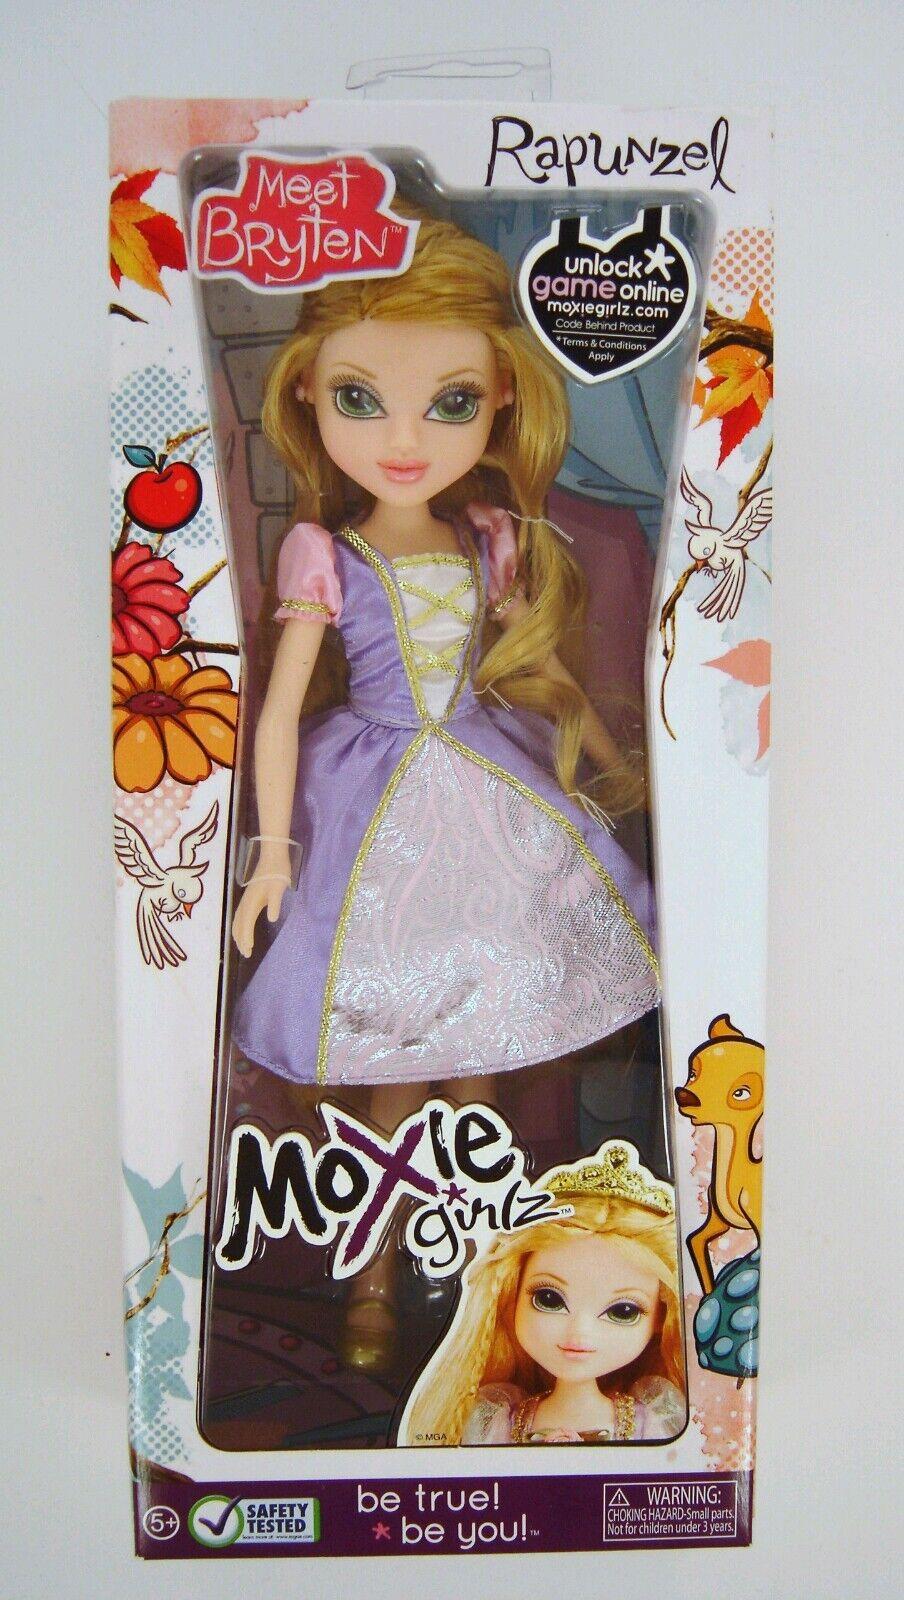 tempo libero Moxie Girlz Bryten come come come Rapunzel  memorizzare